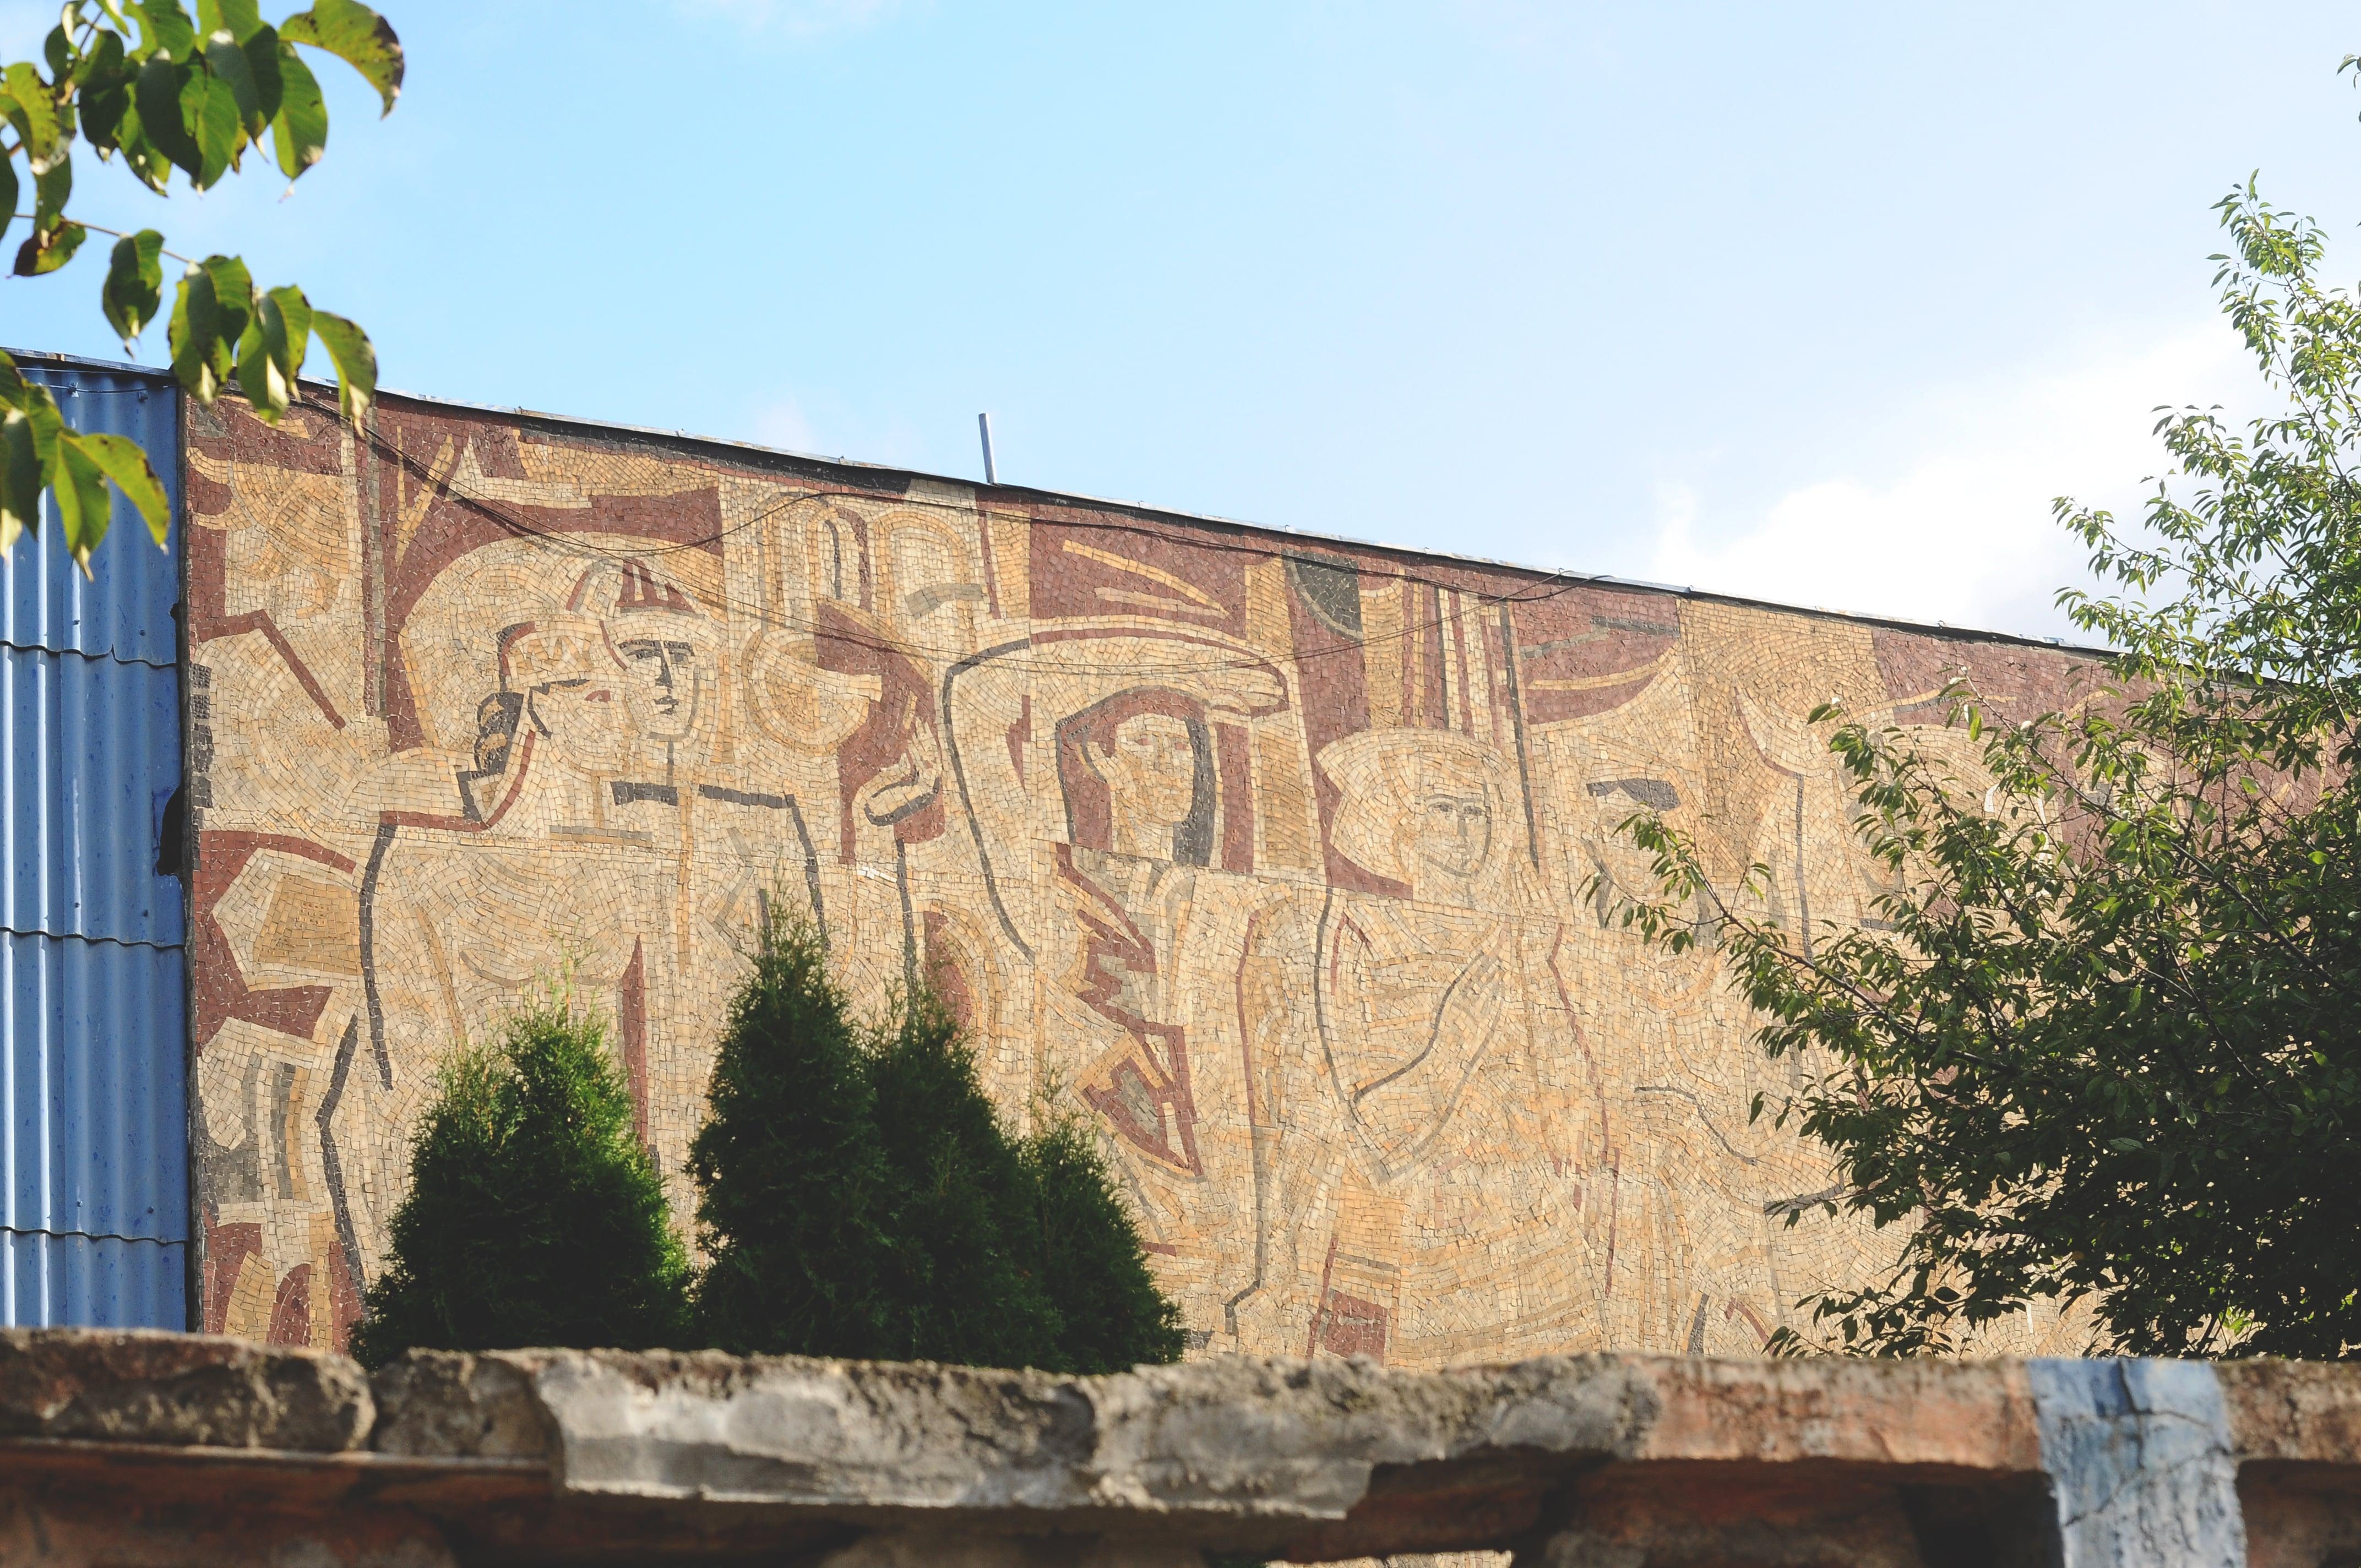 Mural fabrica armatura 2-min